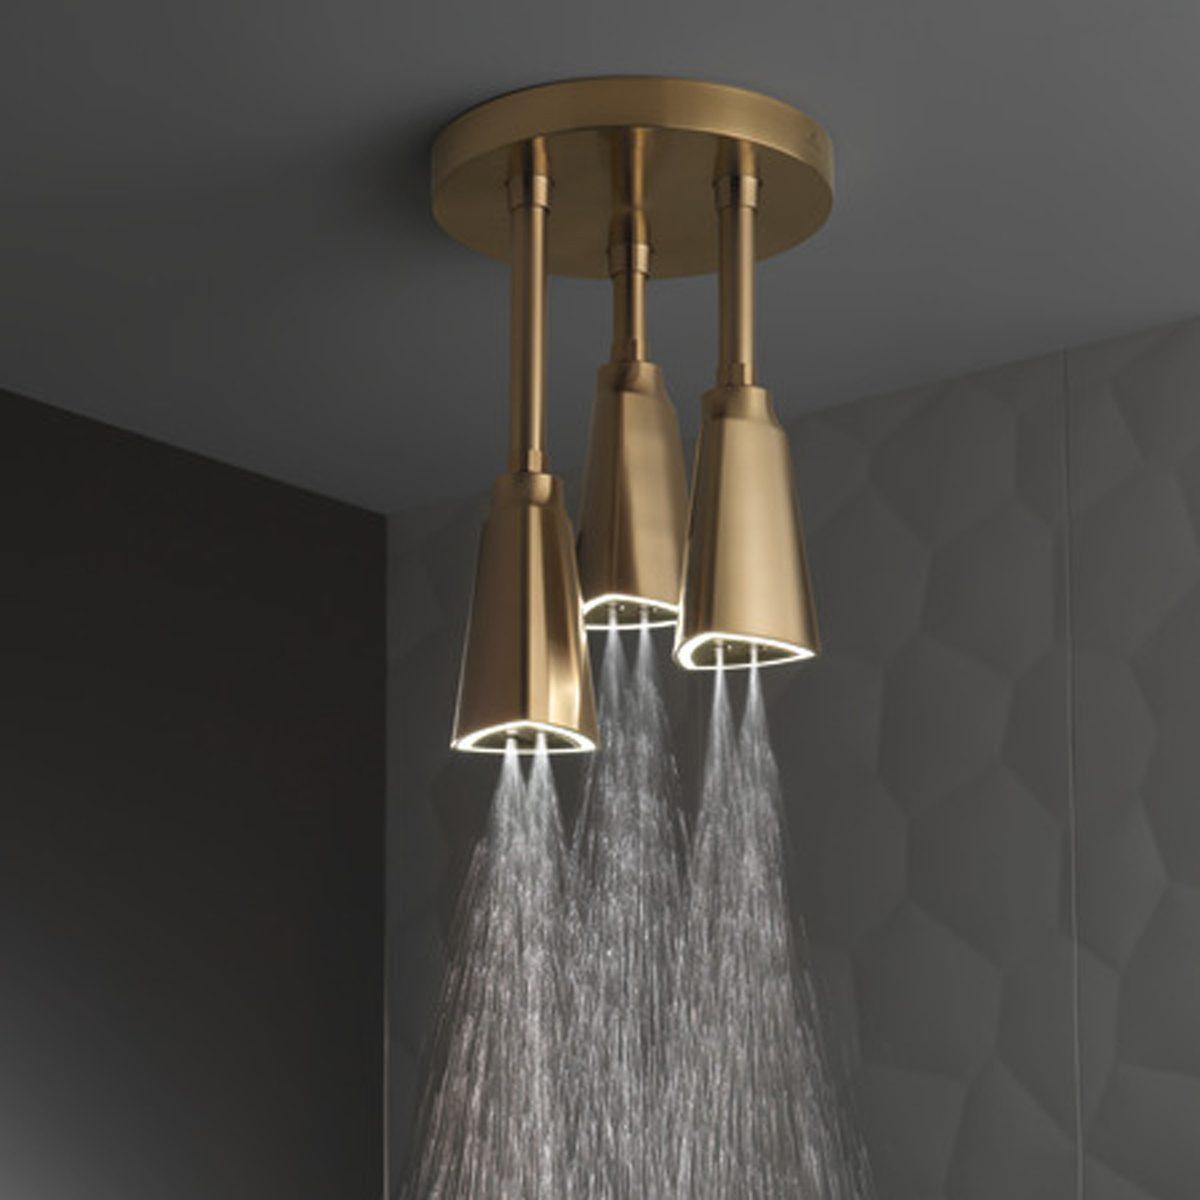 Home Designers Reveal 10 Details That Make a Bathroom Beautiful